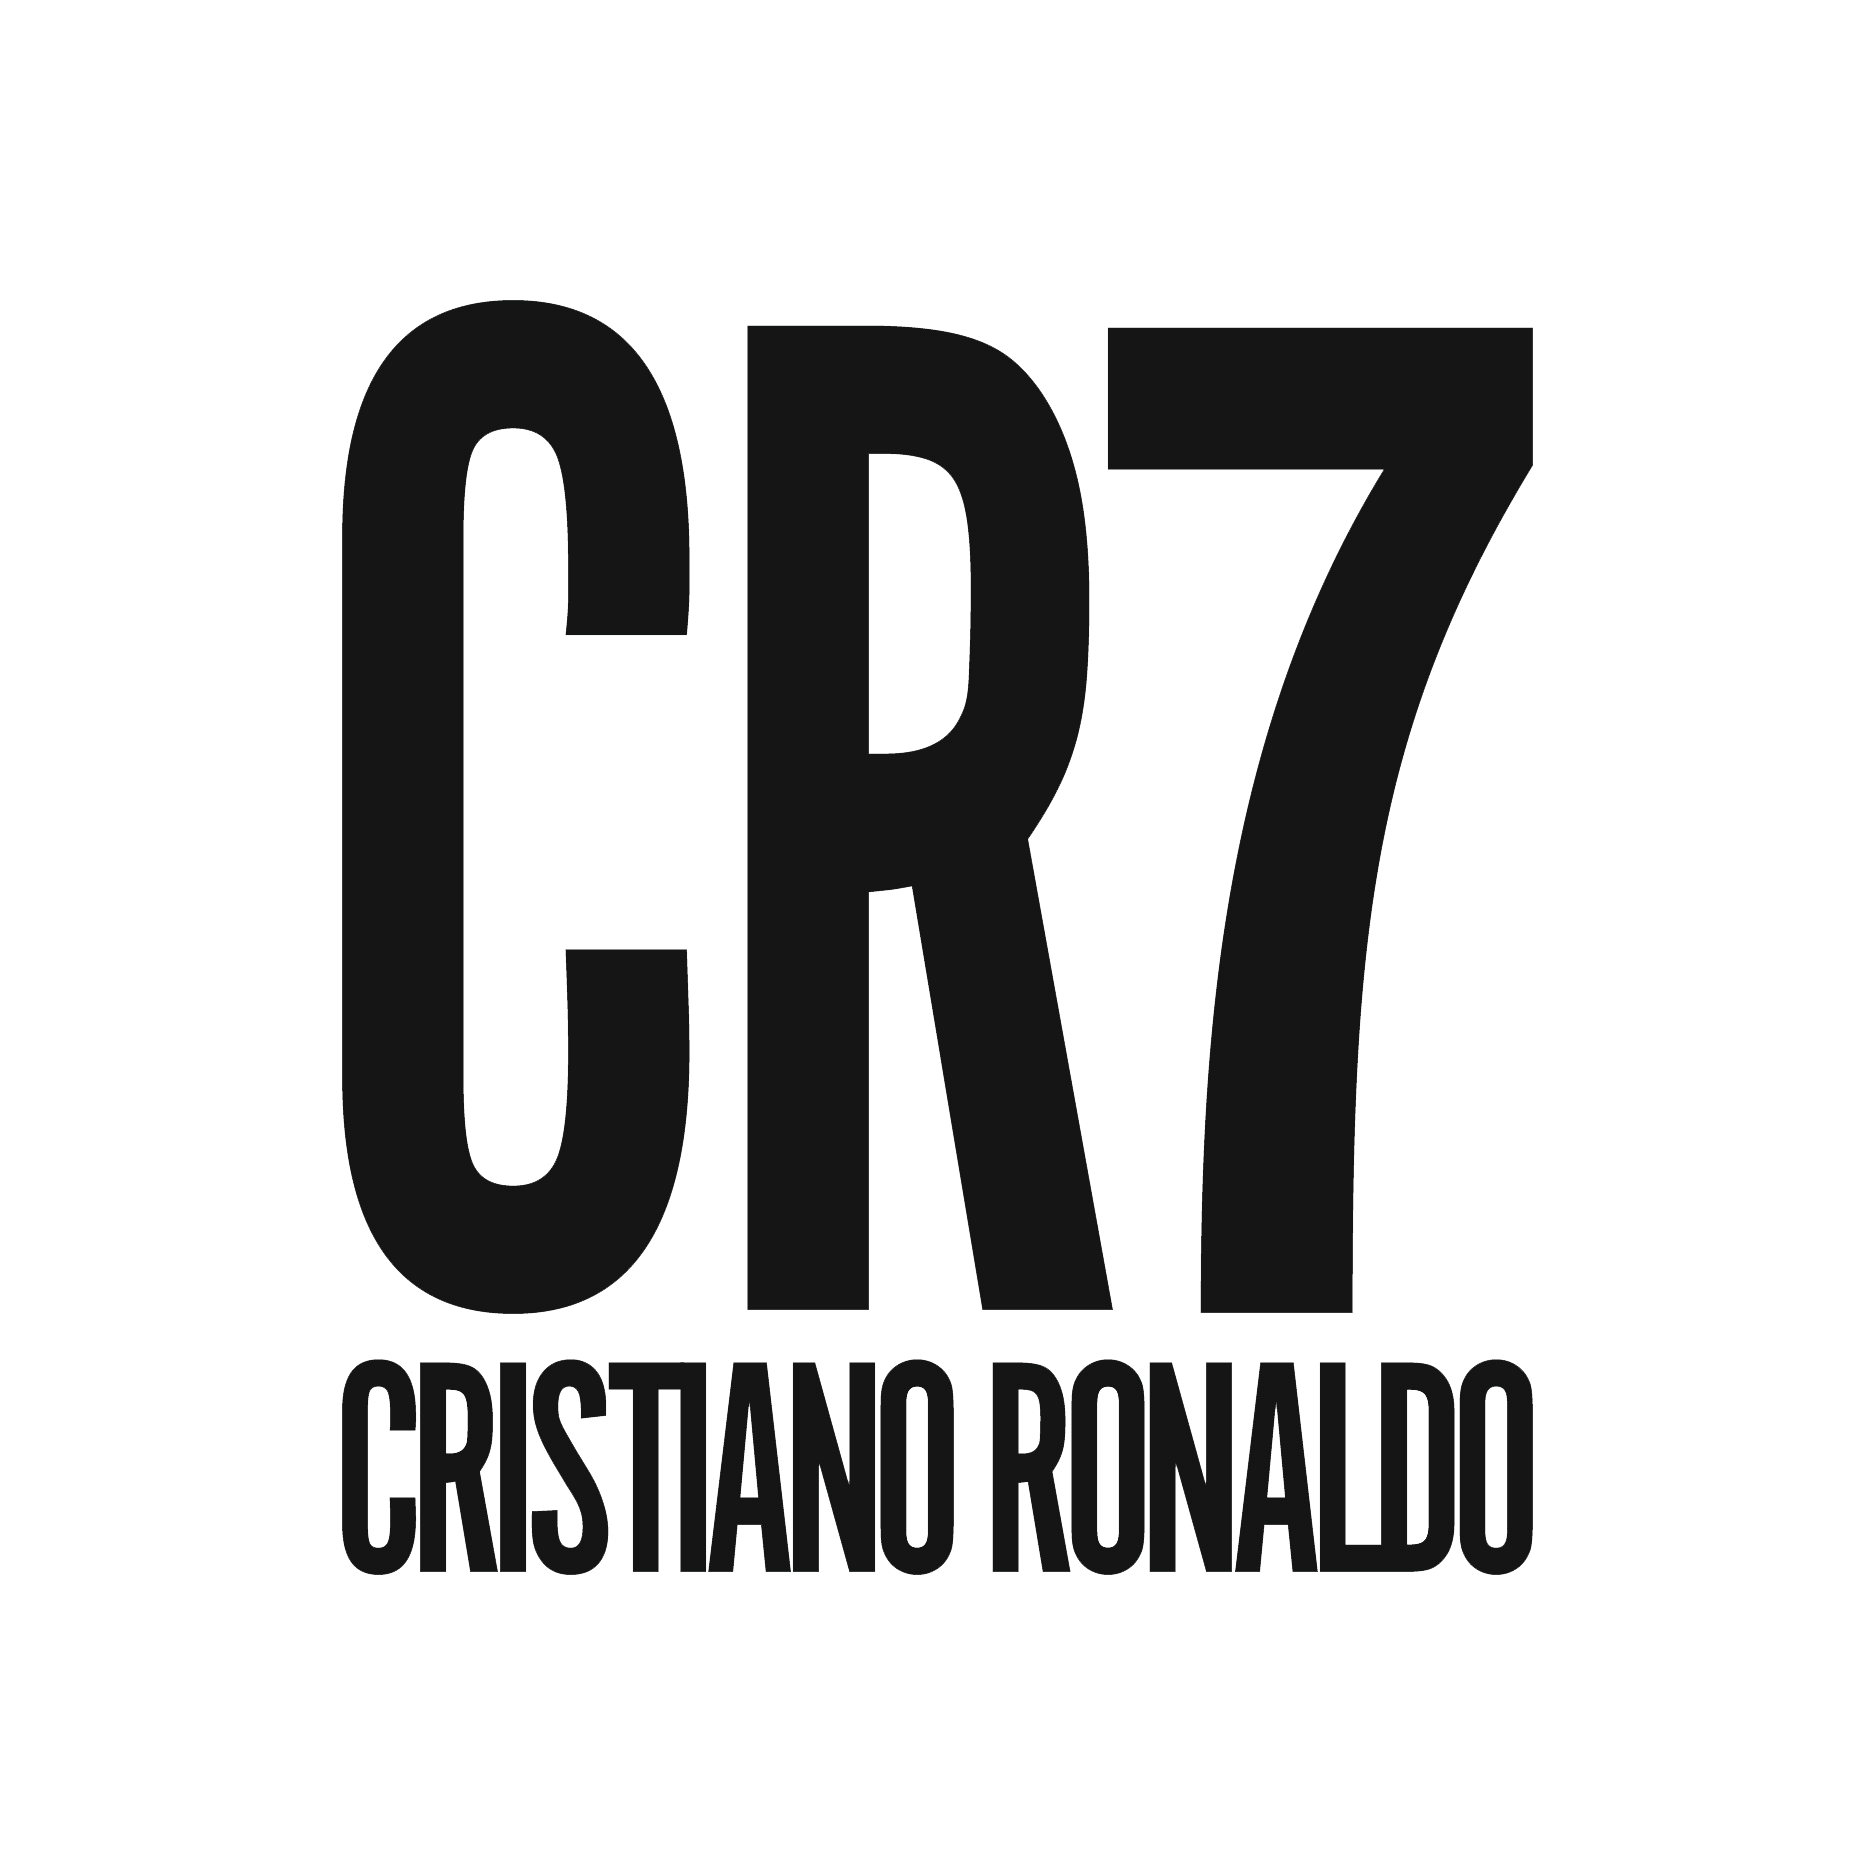 Cr7 Logo Cristiano Ronaldo Png